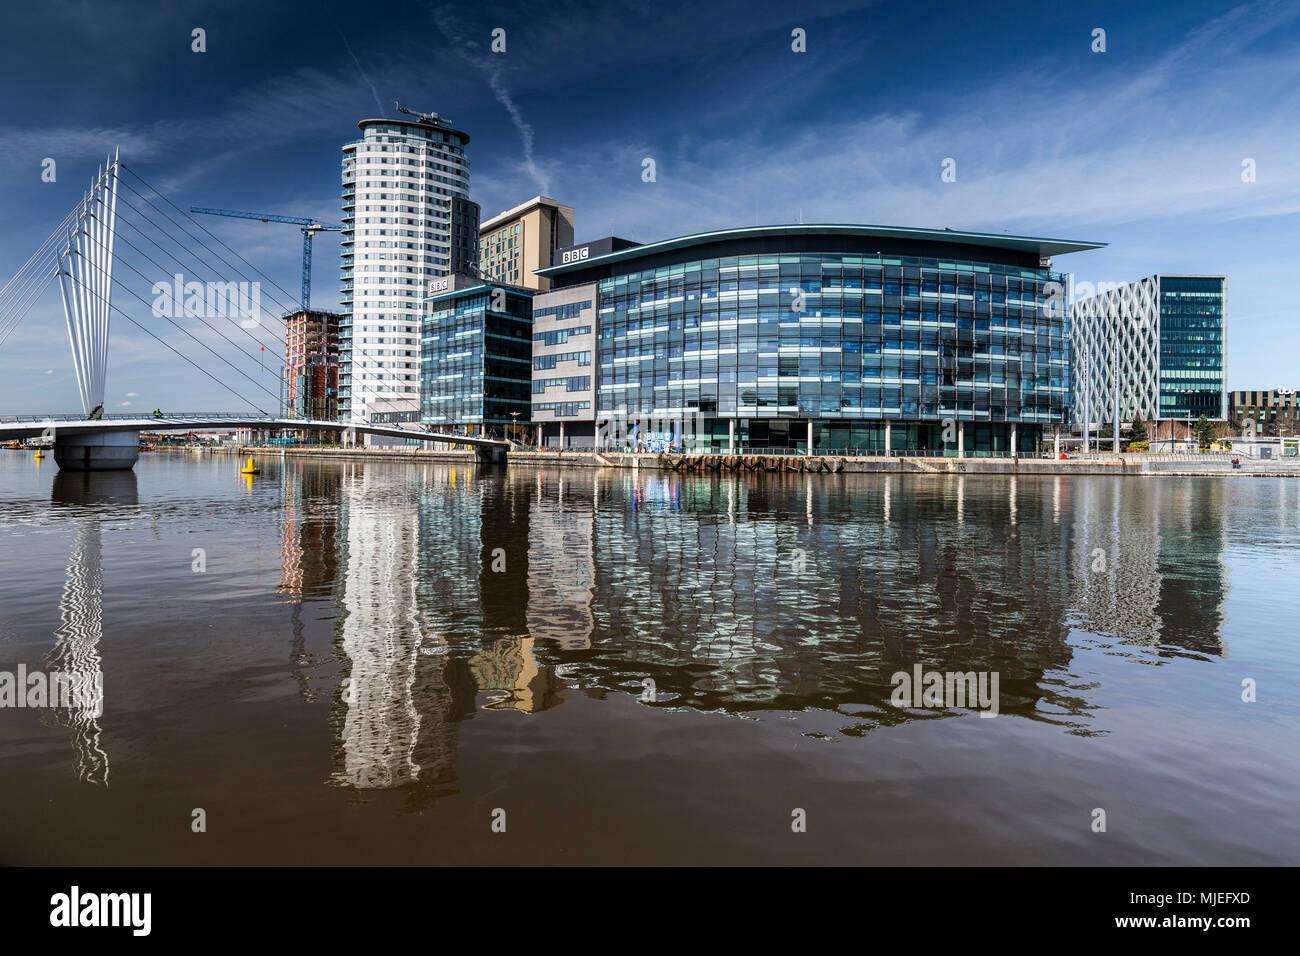 Europe, England, United Kingdom, Manchester - Media City Centre - The BBC Centre and Media City at Salford Quays - Stock Image